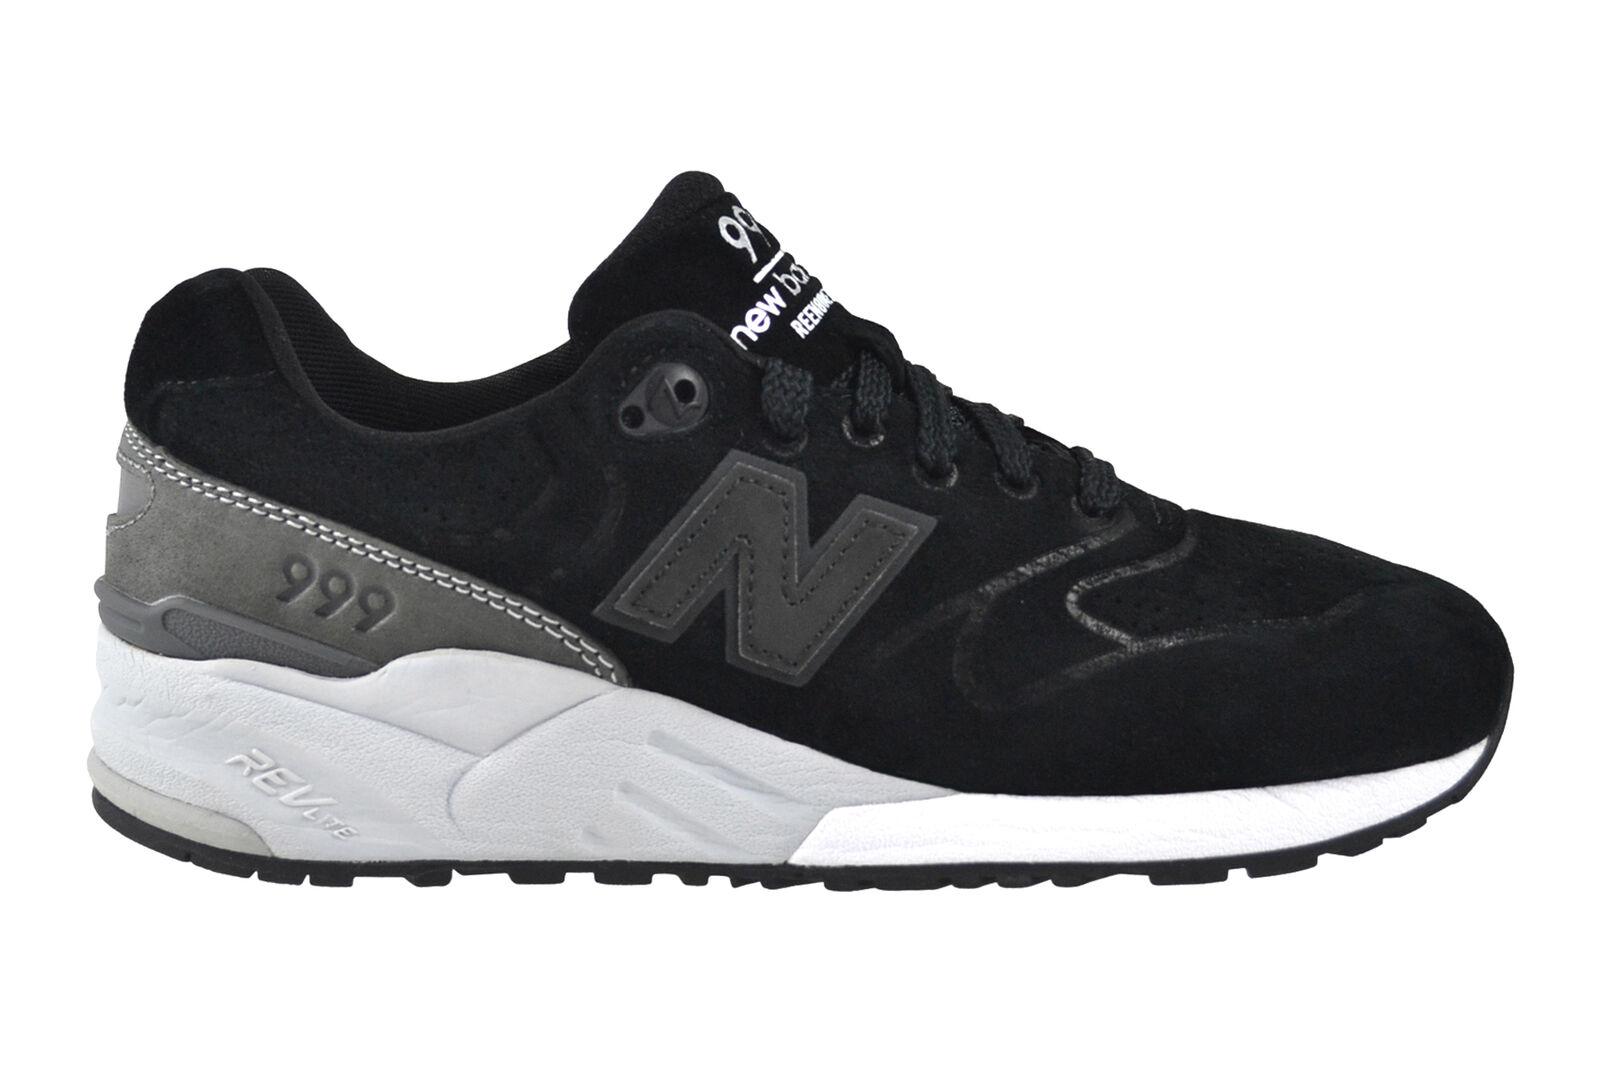 New balance mrl996 ba negro zapatos zapatillas negro